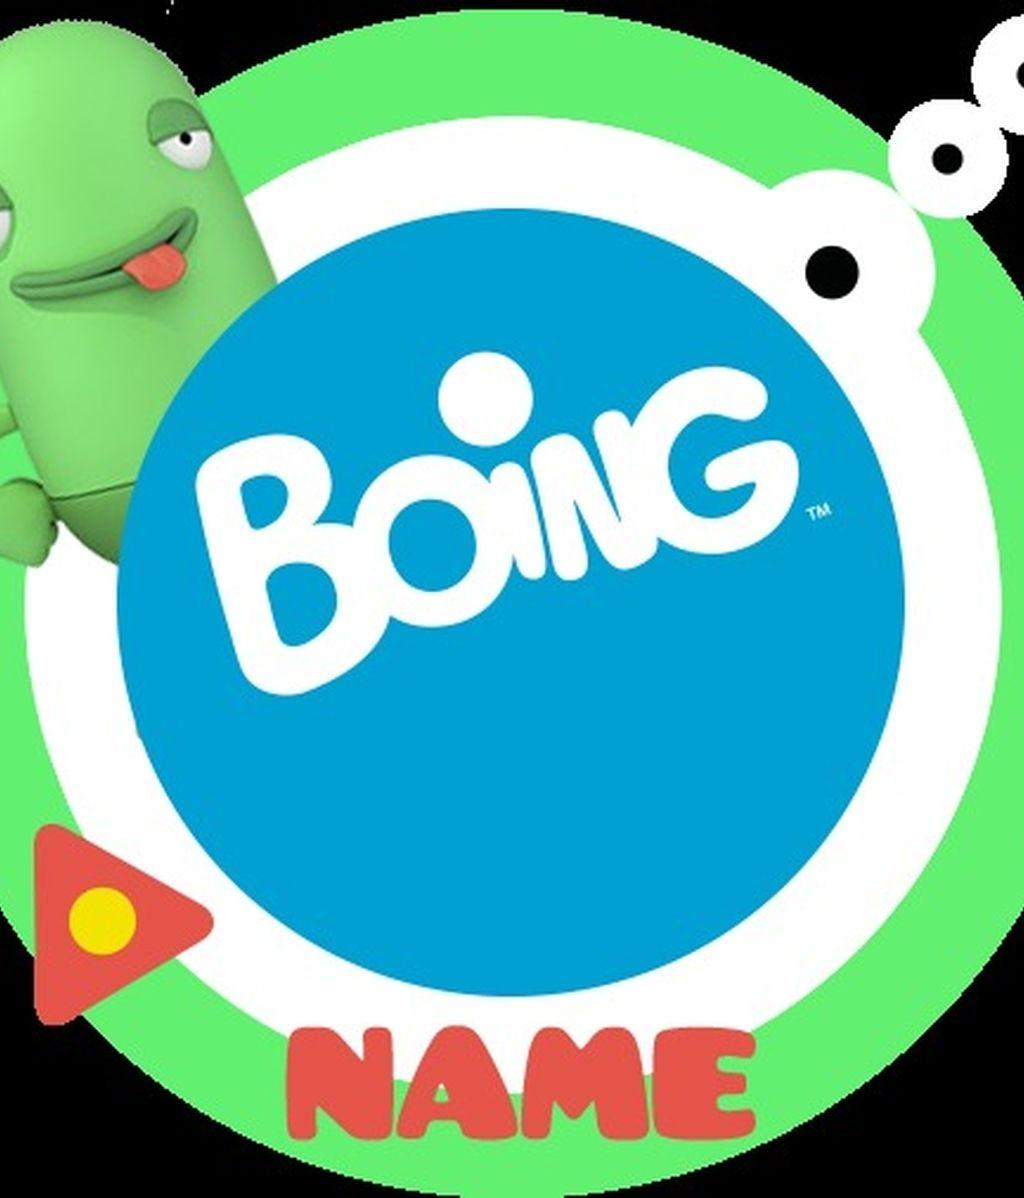 Boing - 'Name'